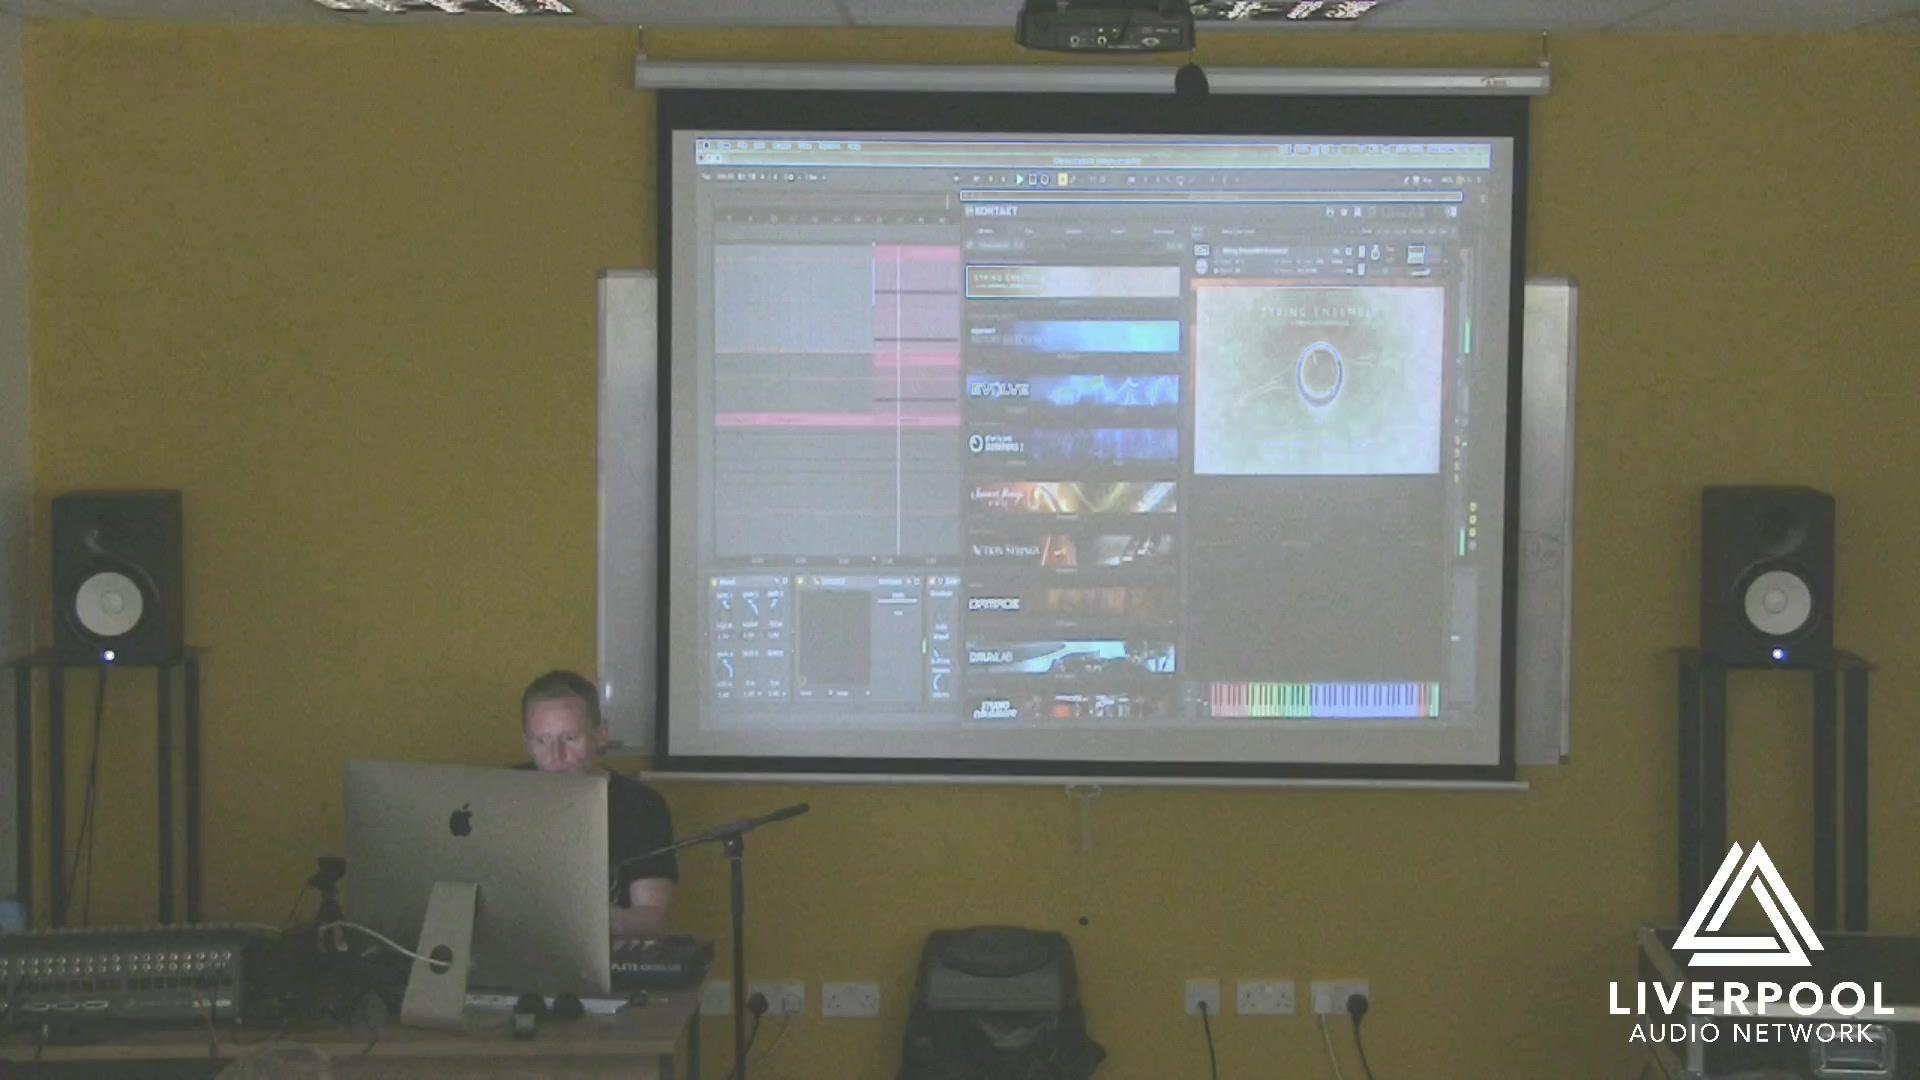 Paul Nolan: Telling Stories Through Sound Masterclass